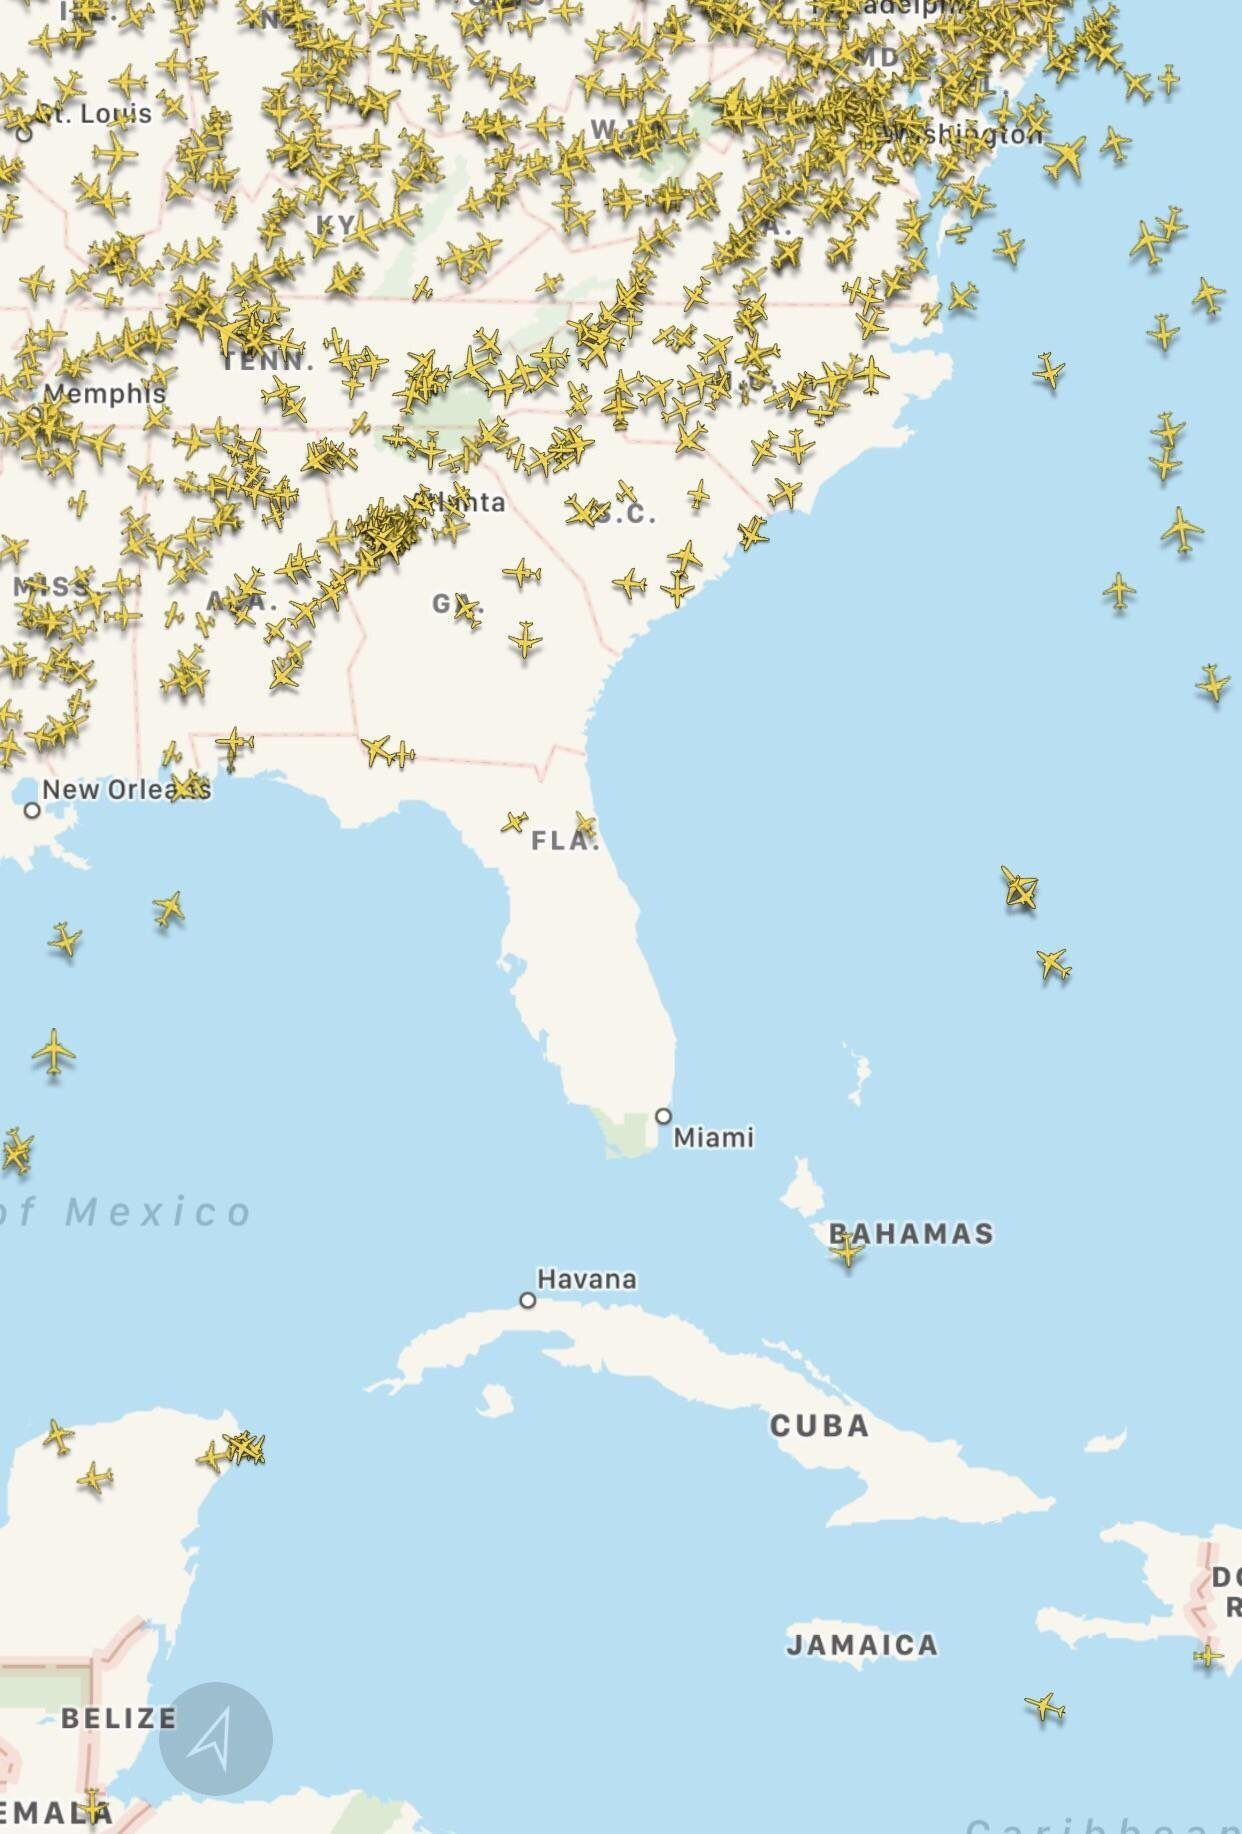 Current air traffic over Florida #florida #tampa #stpete ... on washington traffic map, arkansas traffic map, massachusetts traffic map, grand rapids traffic map, hawaii traffic map, newark traffic map, dallas fort worth traffic map, hampton roads traffic map, tampa schools, buffalo traffic map, galveston traffic map, nevada traffic map, austin traffic map, phoenix traffic map, new york traffic map, pittsburgh traffic map, boston traffic map, charlotte traffic map, mississippi traffic map, tampa weather,